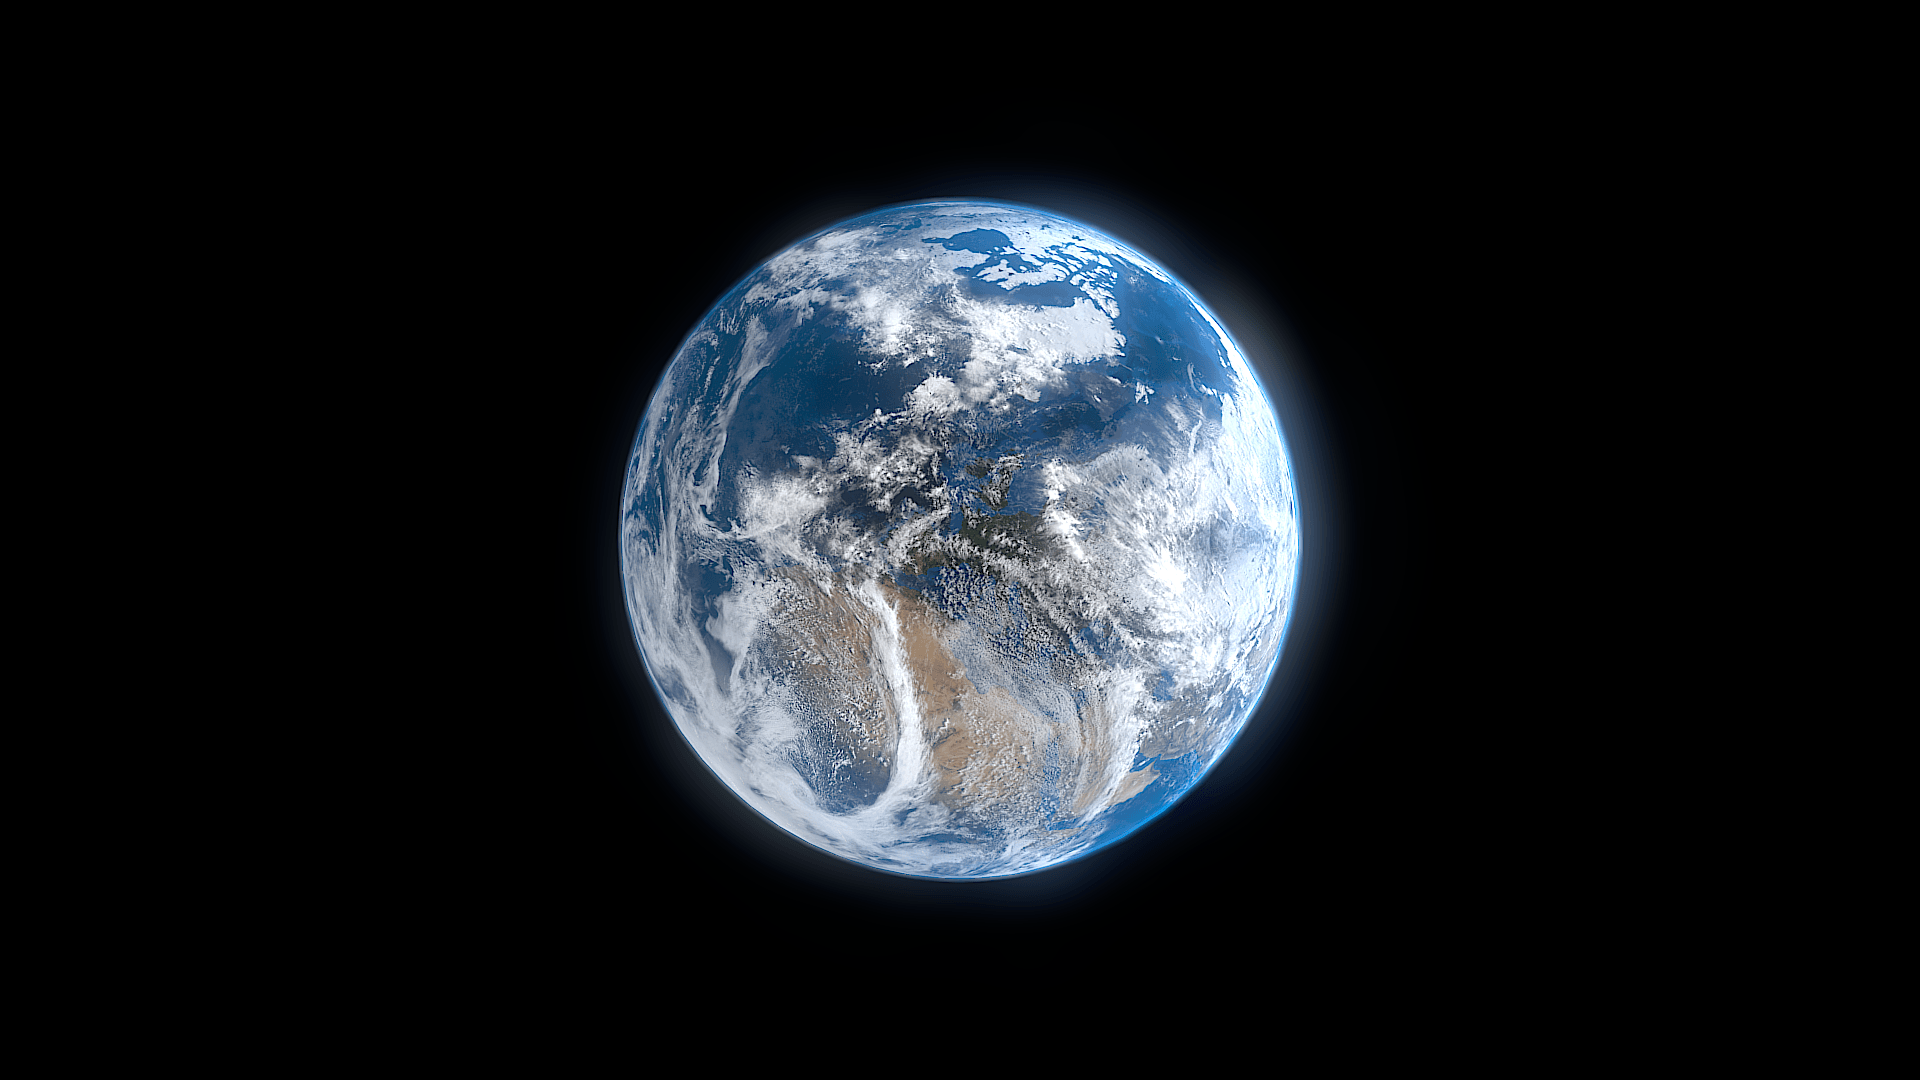 Photo - Blender - Rendering Earth